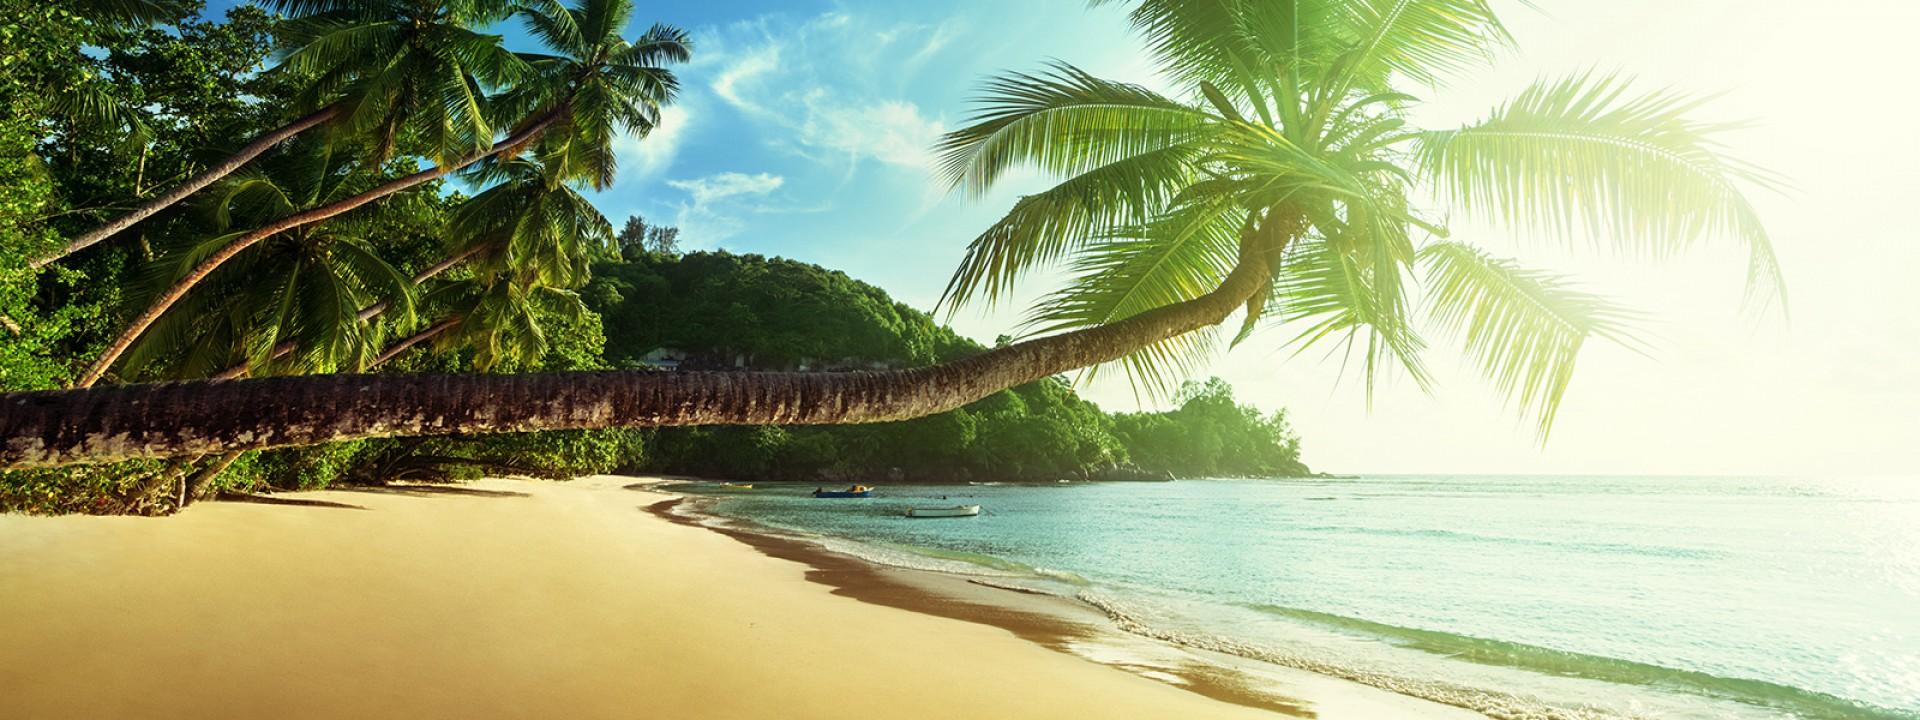 Voli per Seychelles